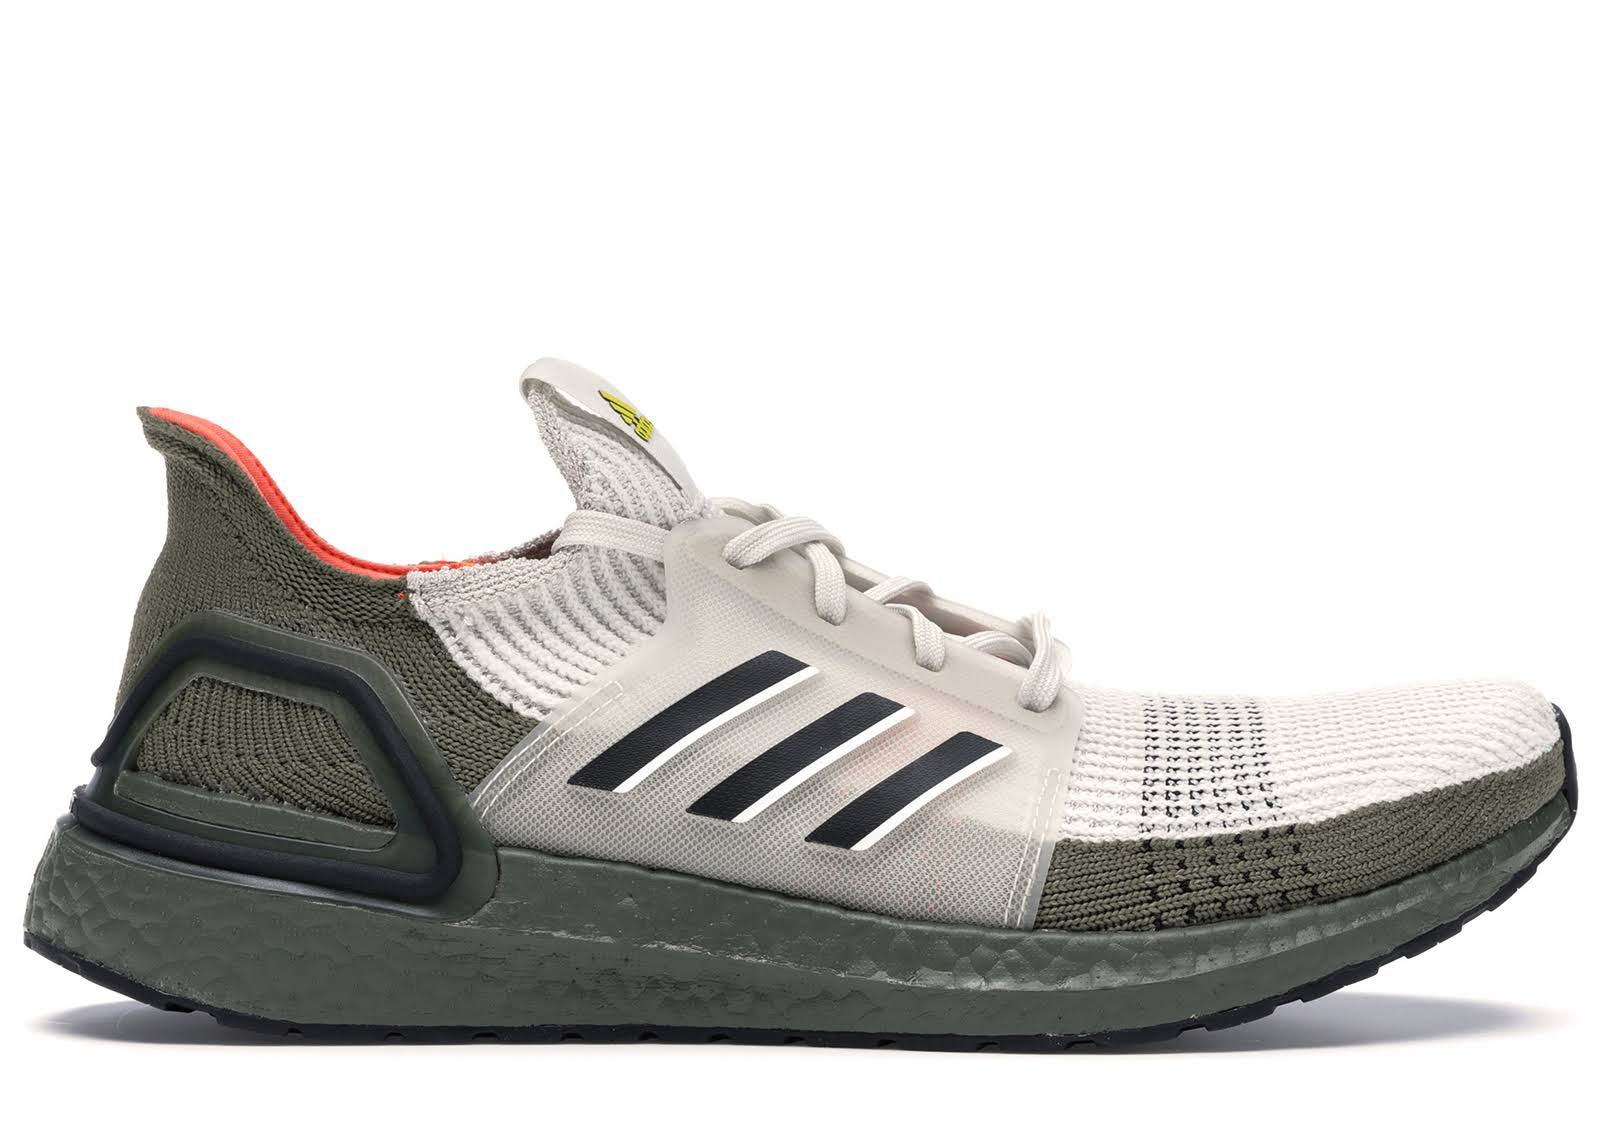 adidas Ultra Boost 19 Olive Beige